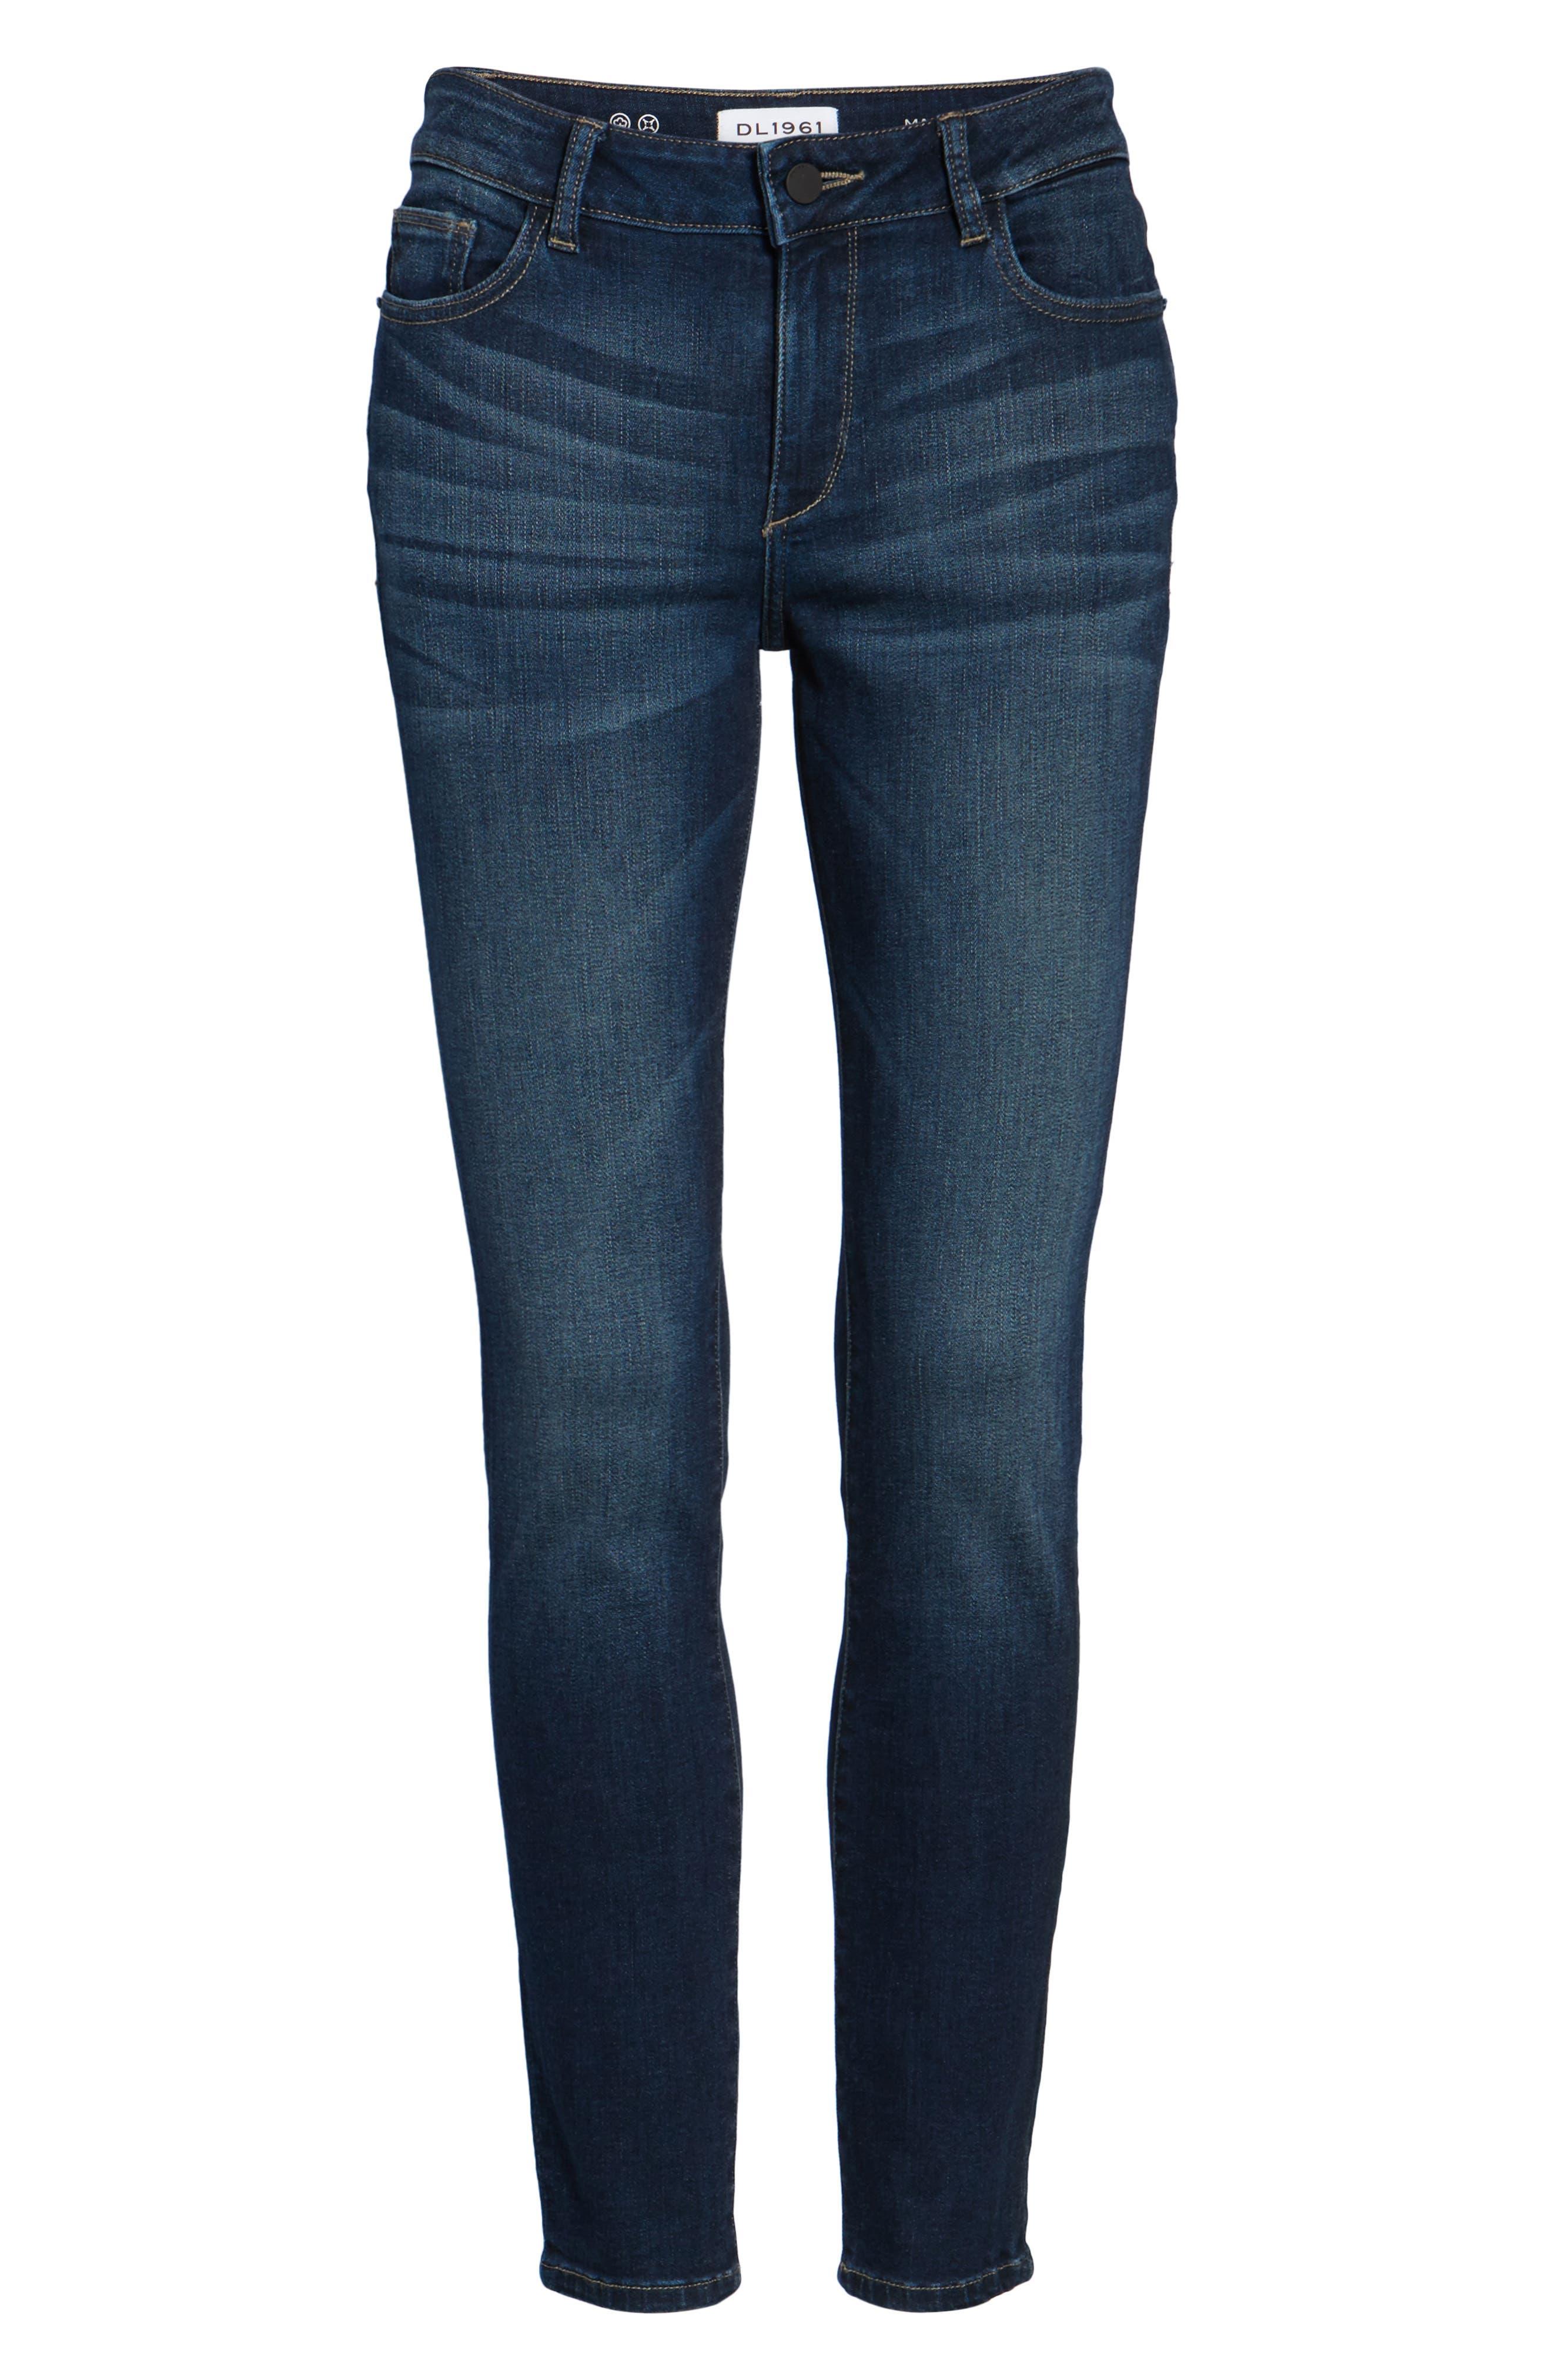 Margaux Instasculpt Ankle Skinny Jeans,                             Alternate thumbnail 7, color,                             Salt Creek